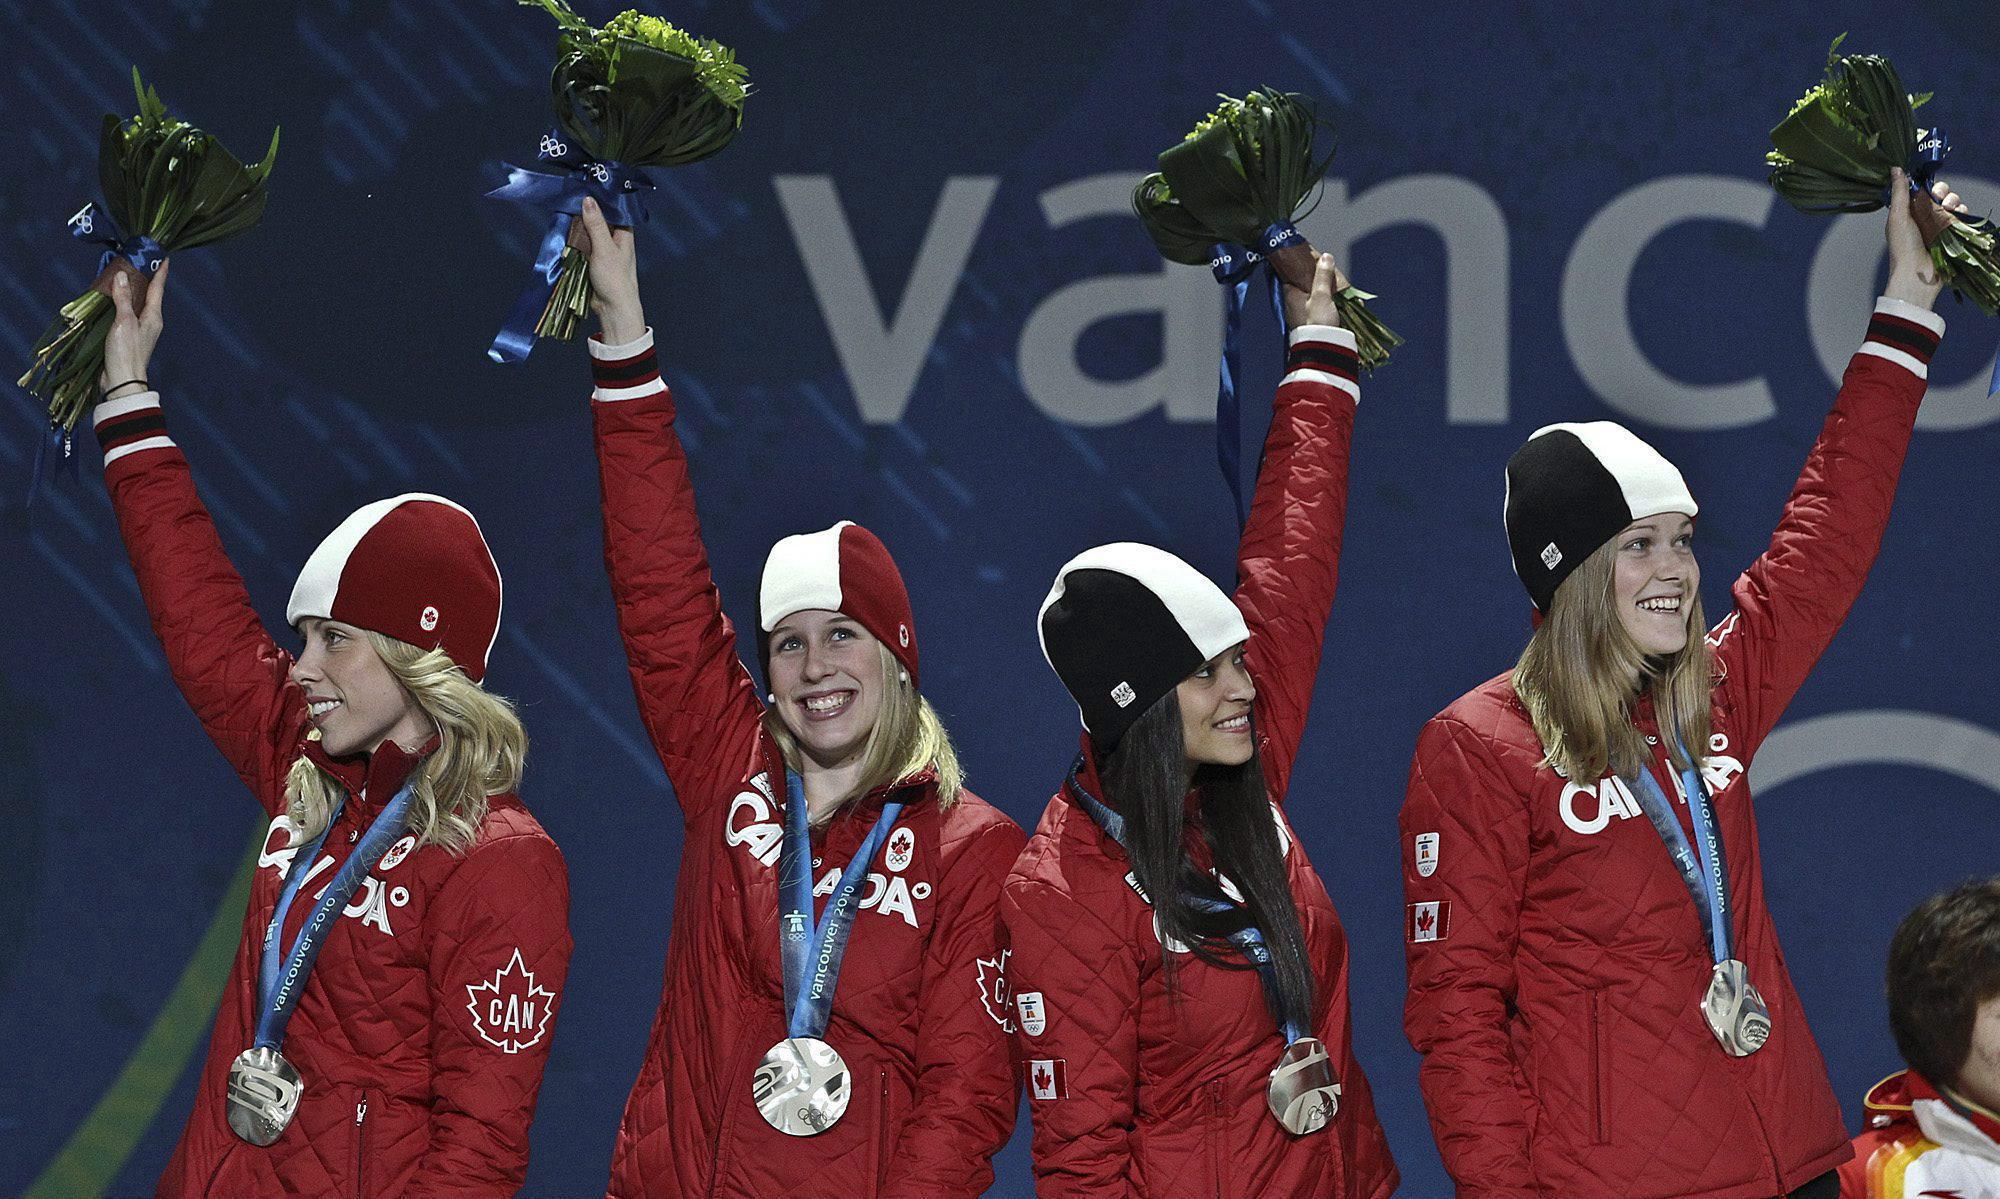 Short track medallists on the podium